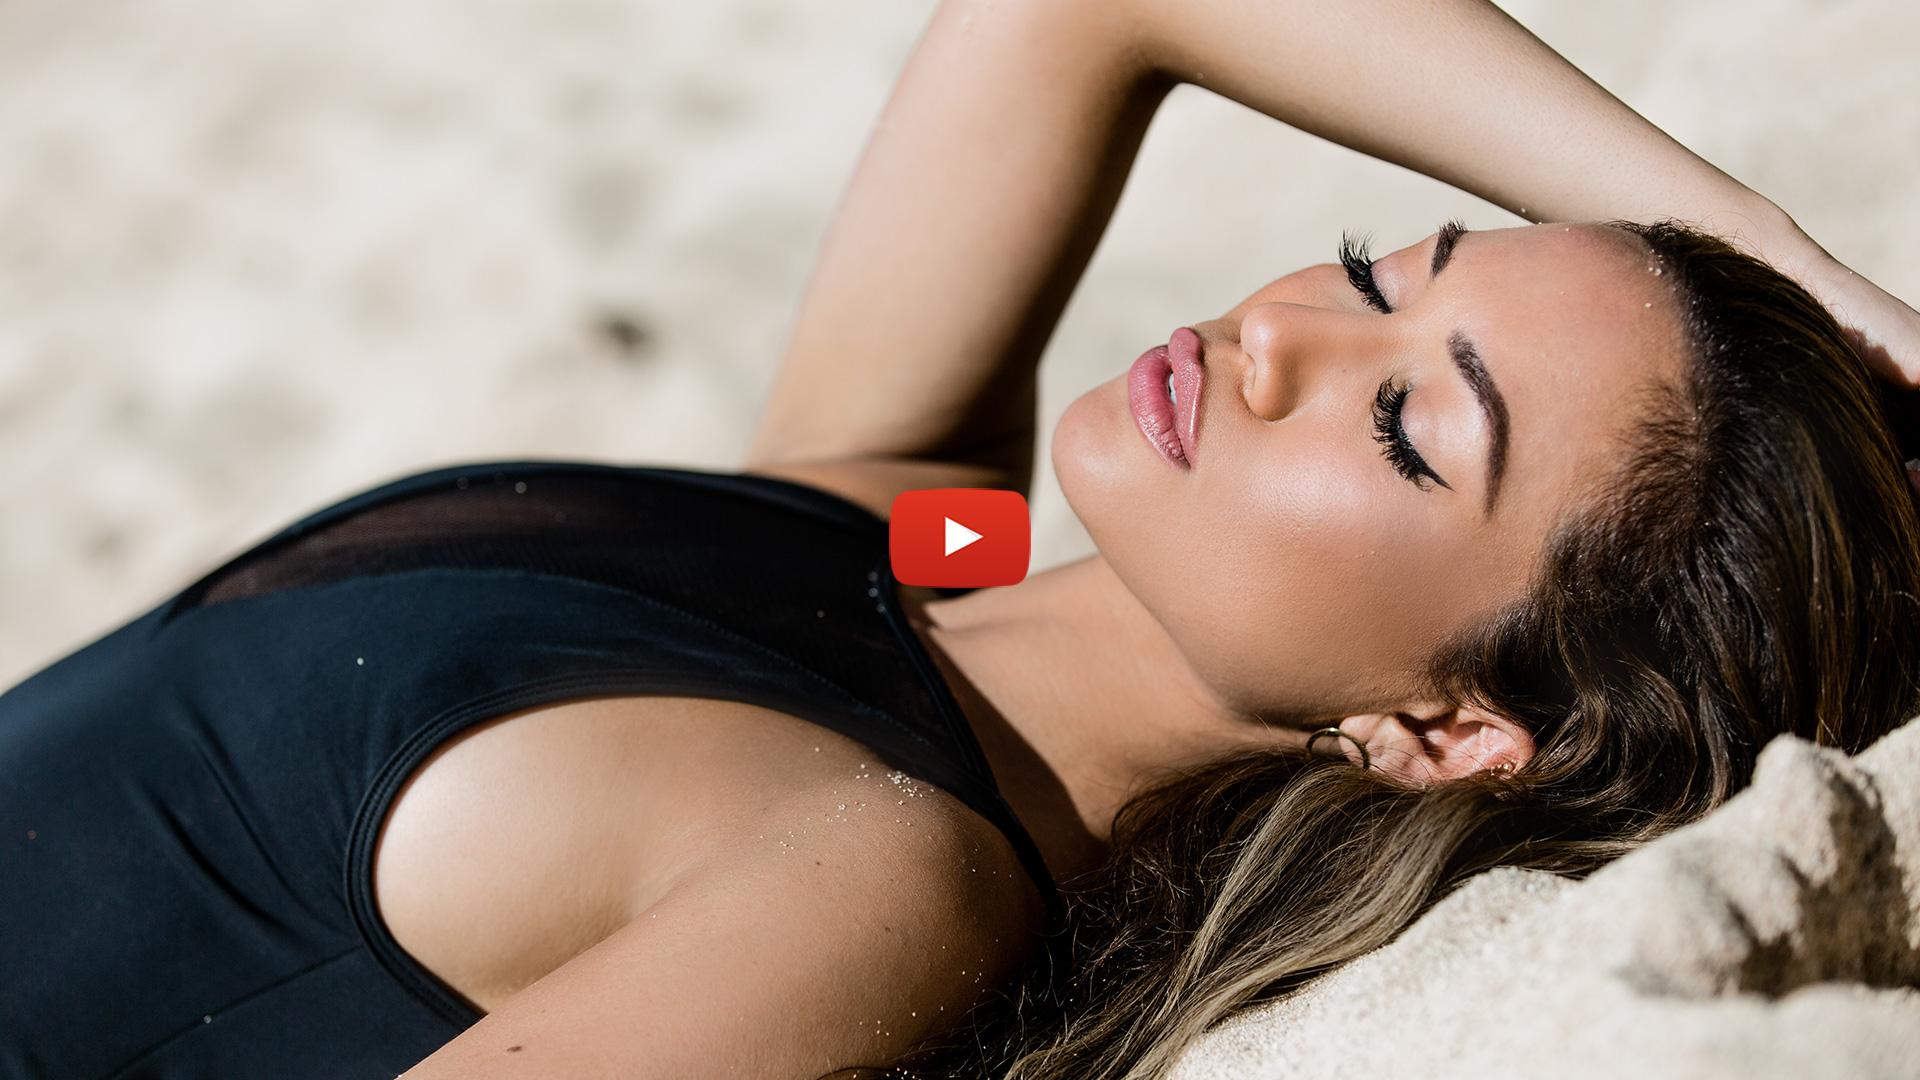 Jessi Malay - Body - Music Video